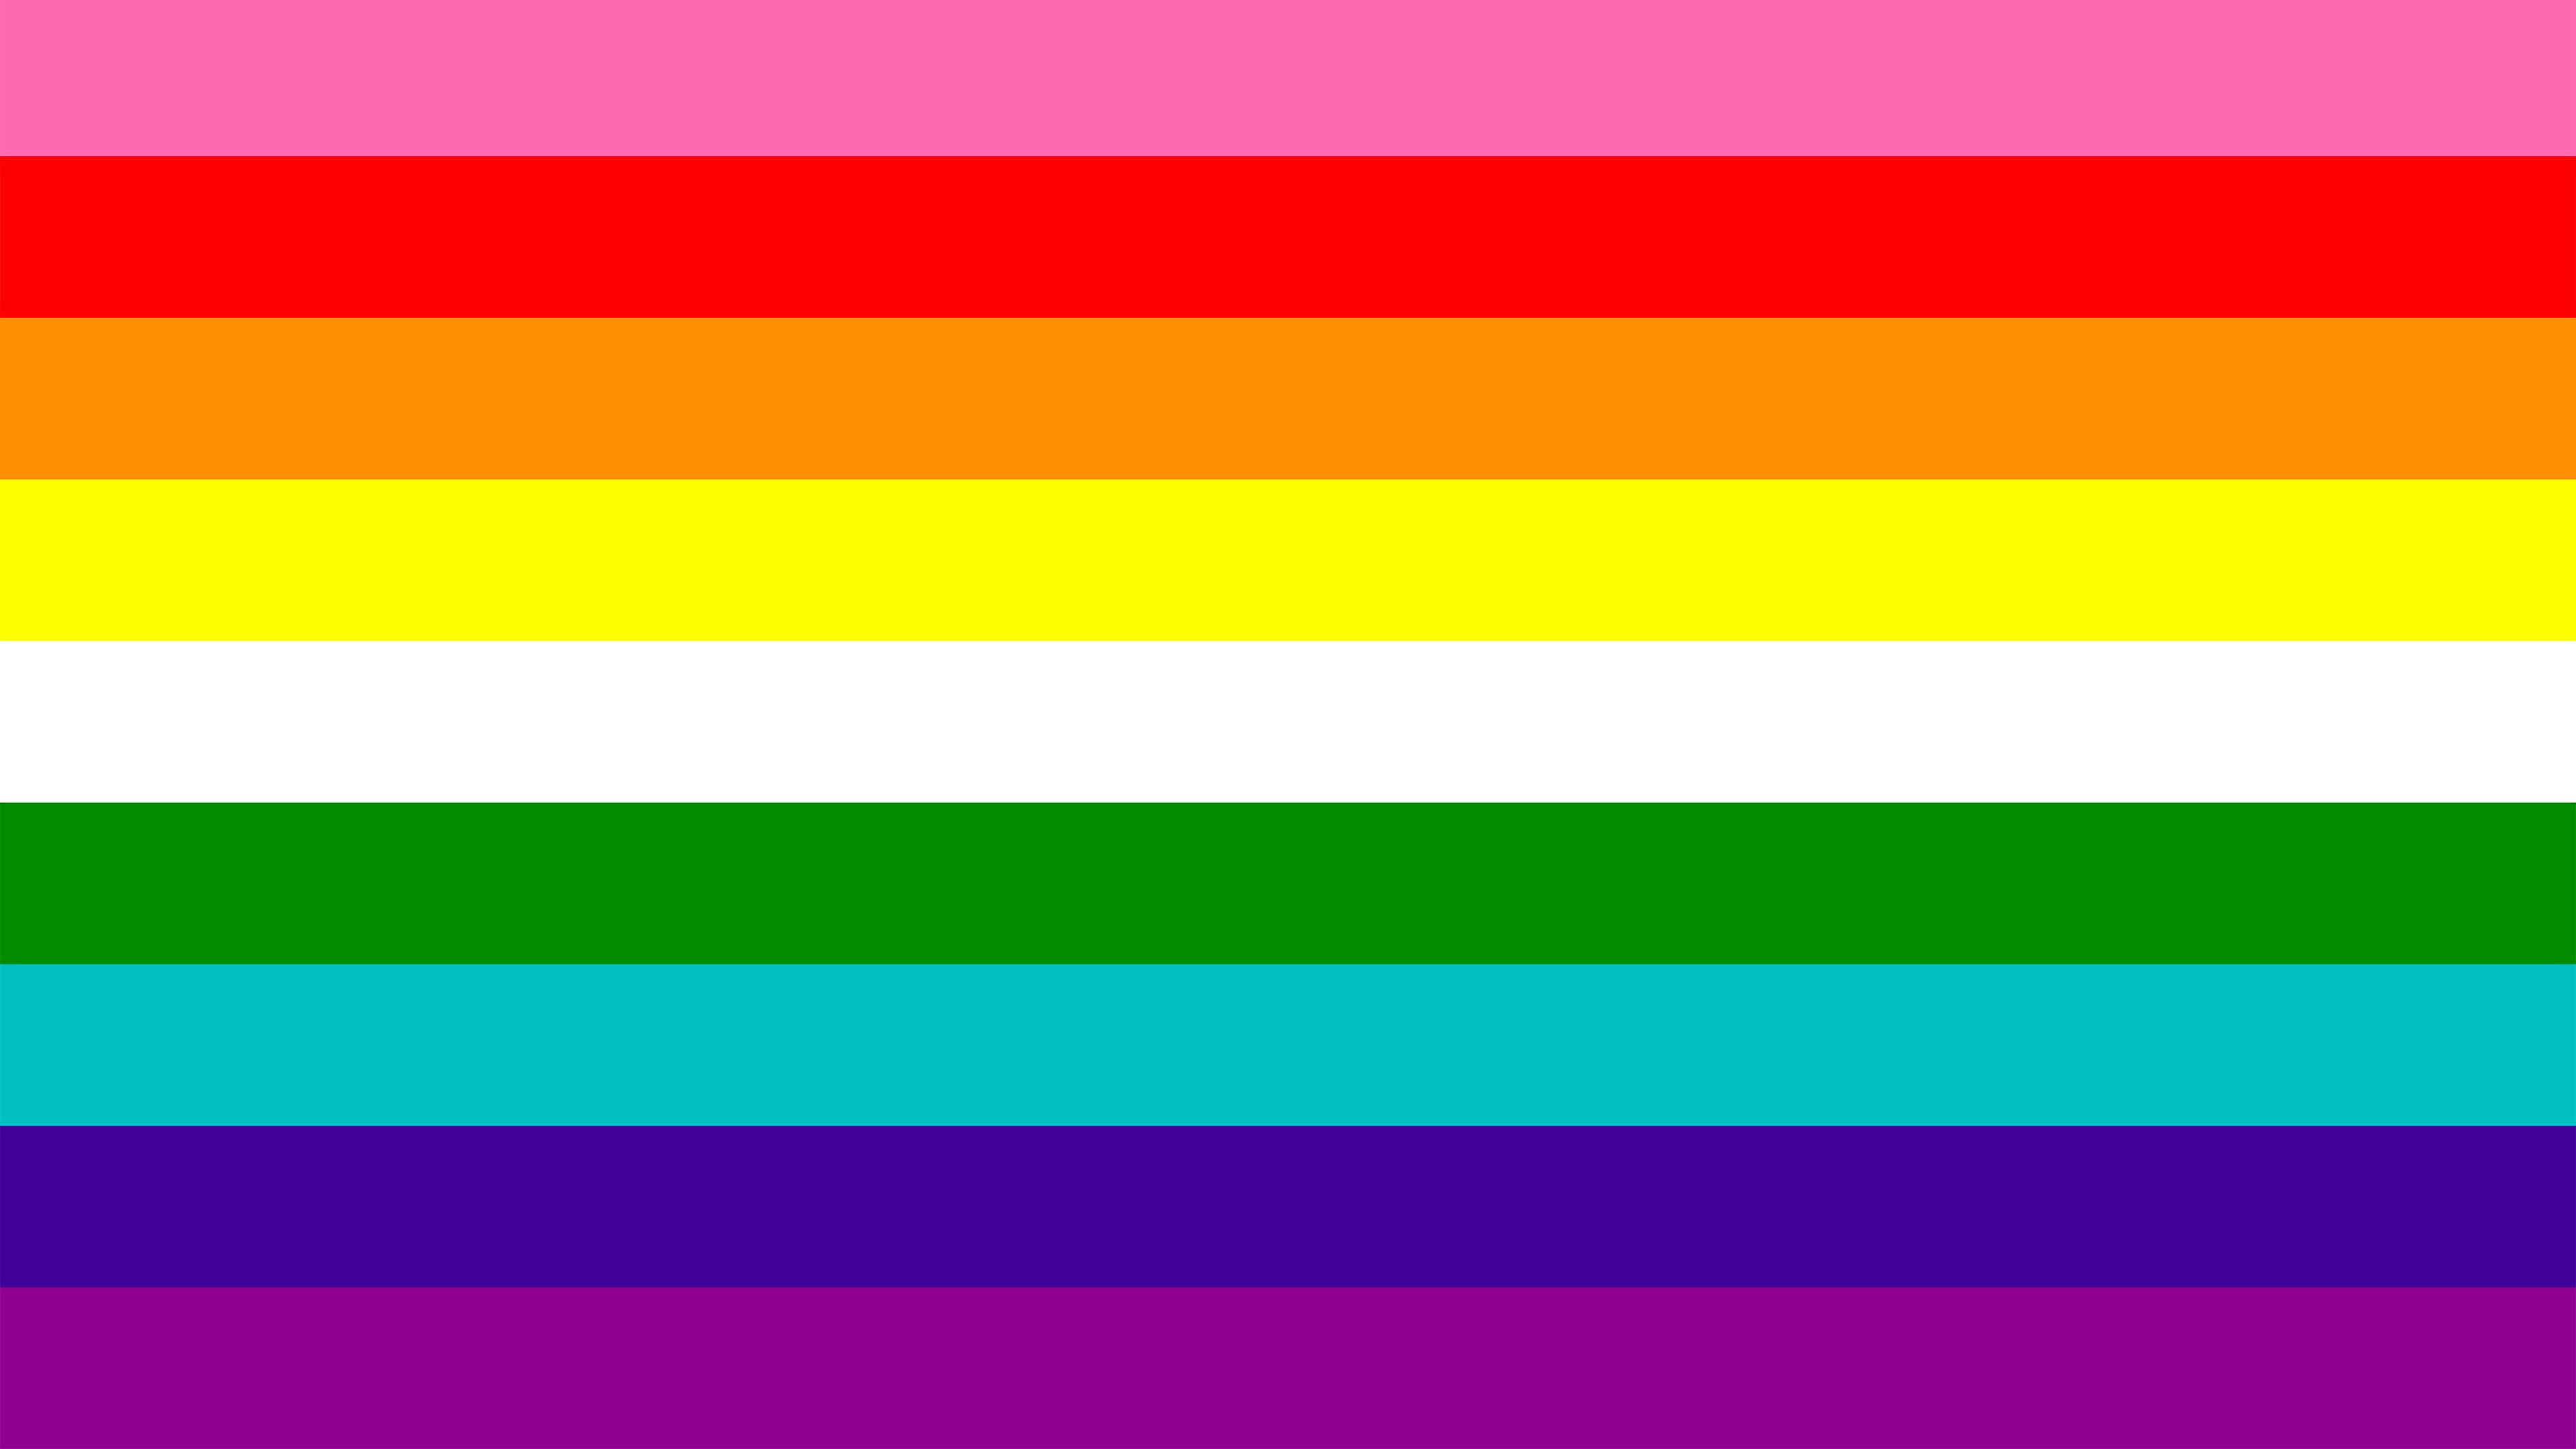 lgbt rainbow flag uhd 4k wallpaper